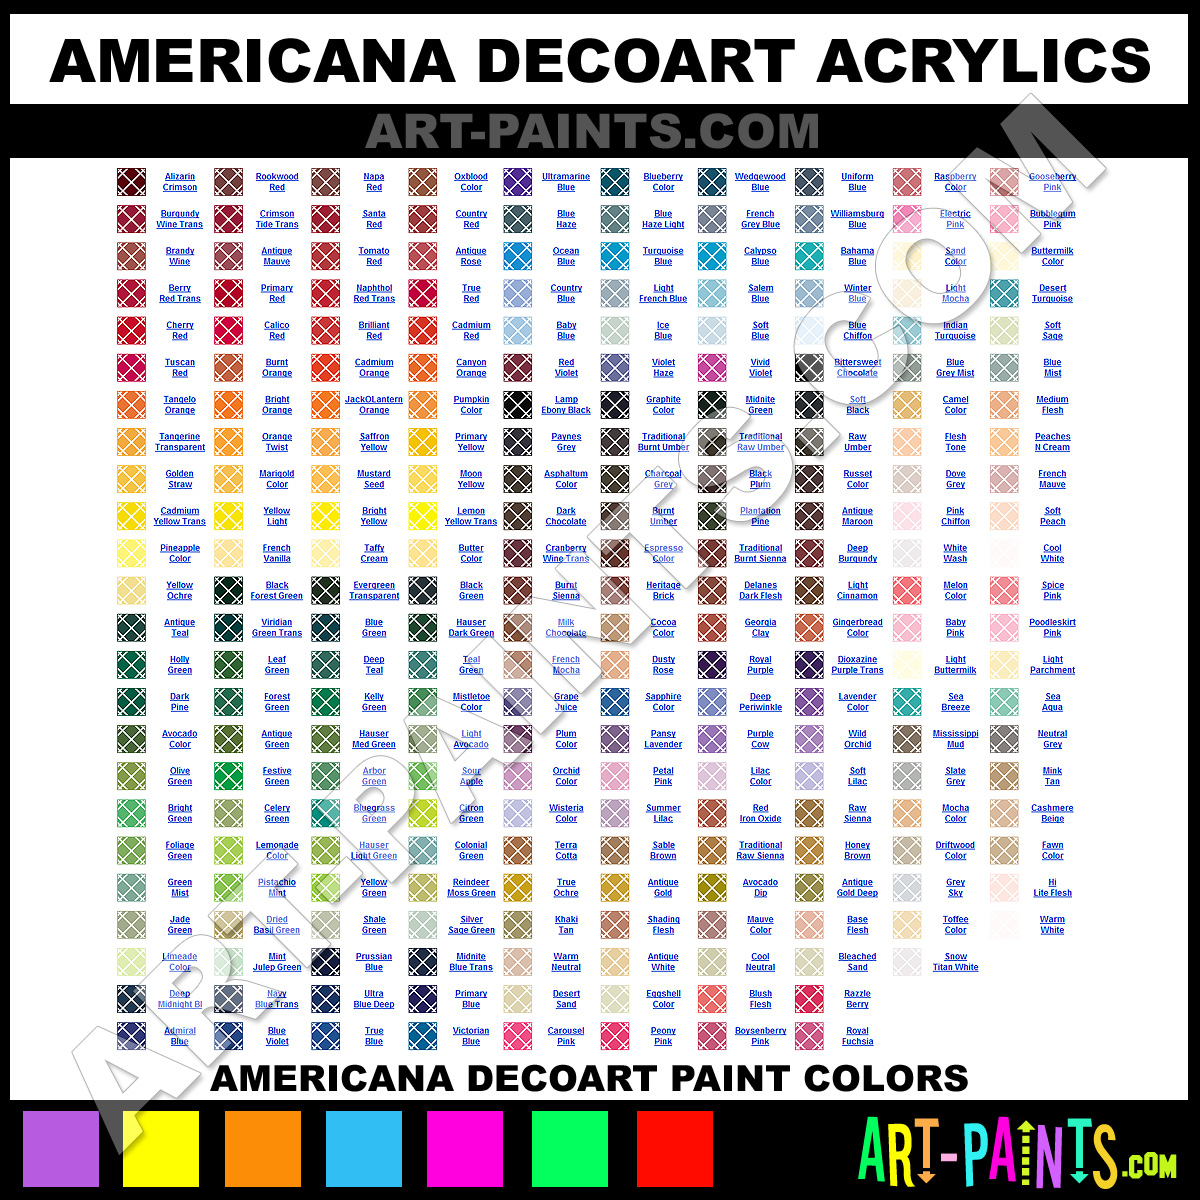 Folk art acrylic paint color chart - Americana Acrylics Americana Decoart Paints